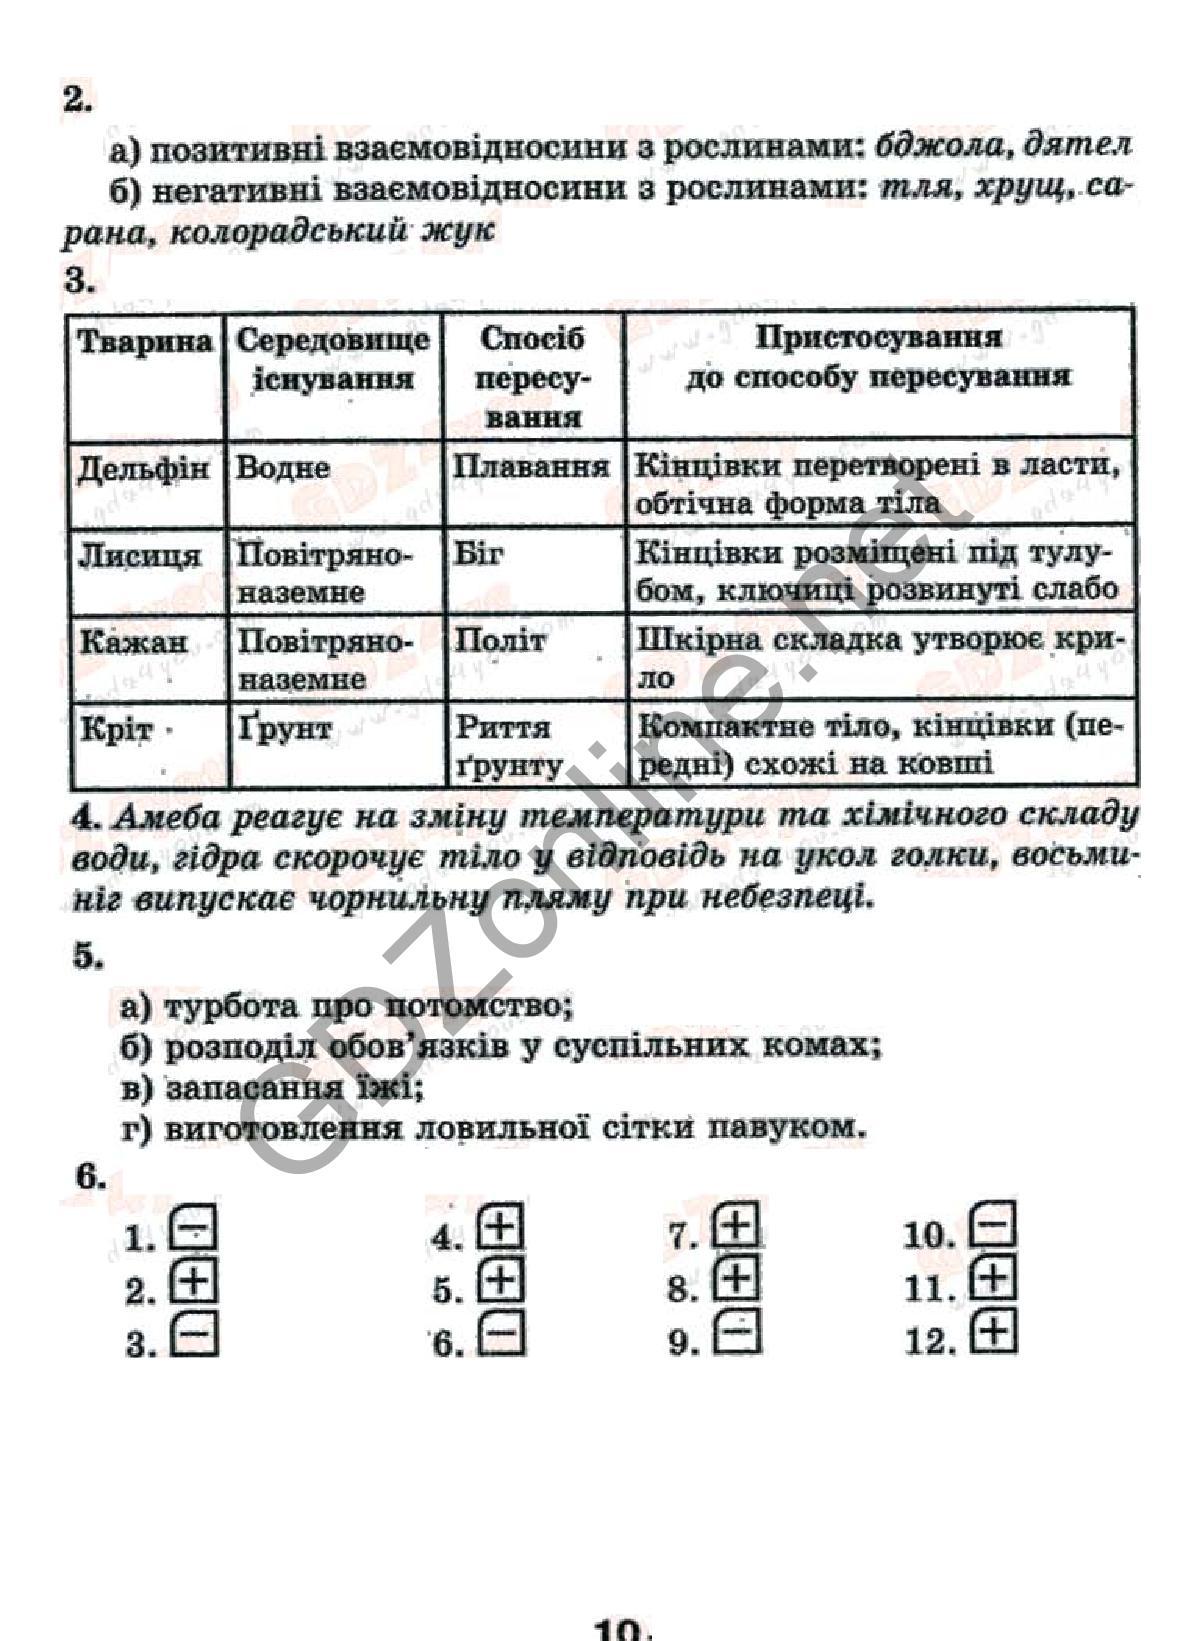 Ответи на зошит по биологий 11 класс котик